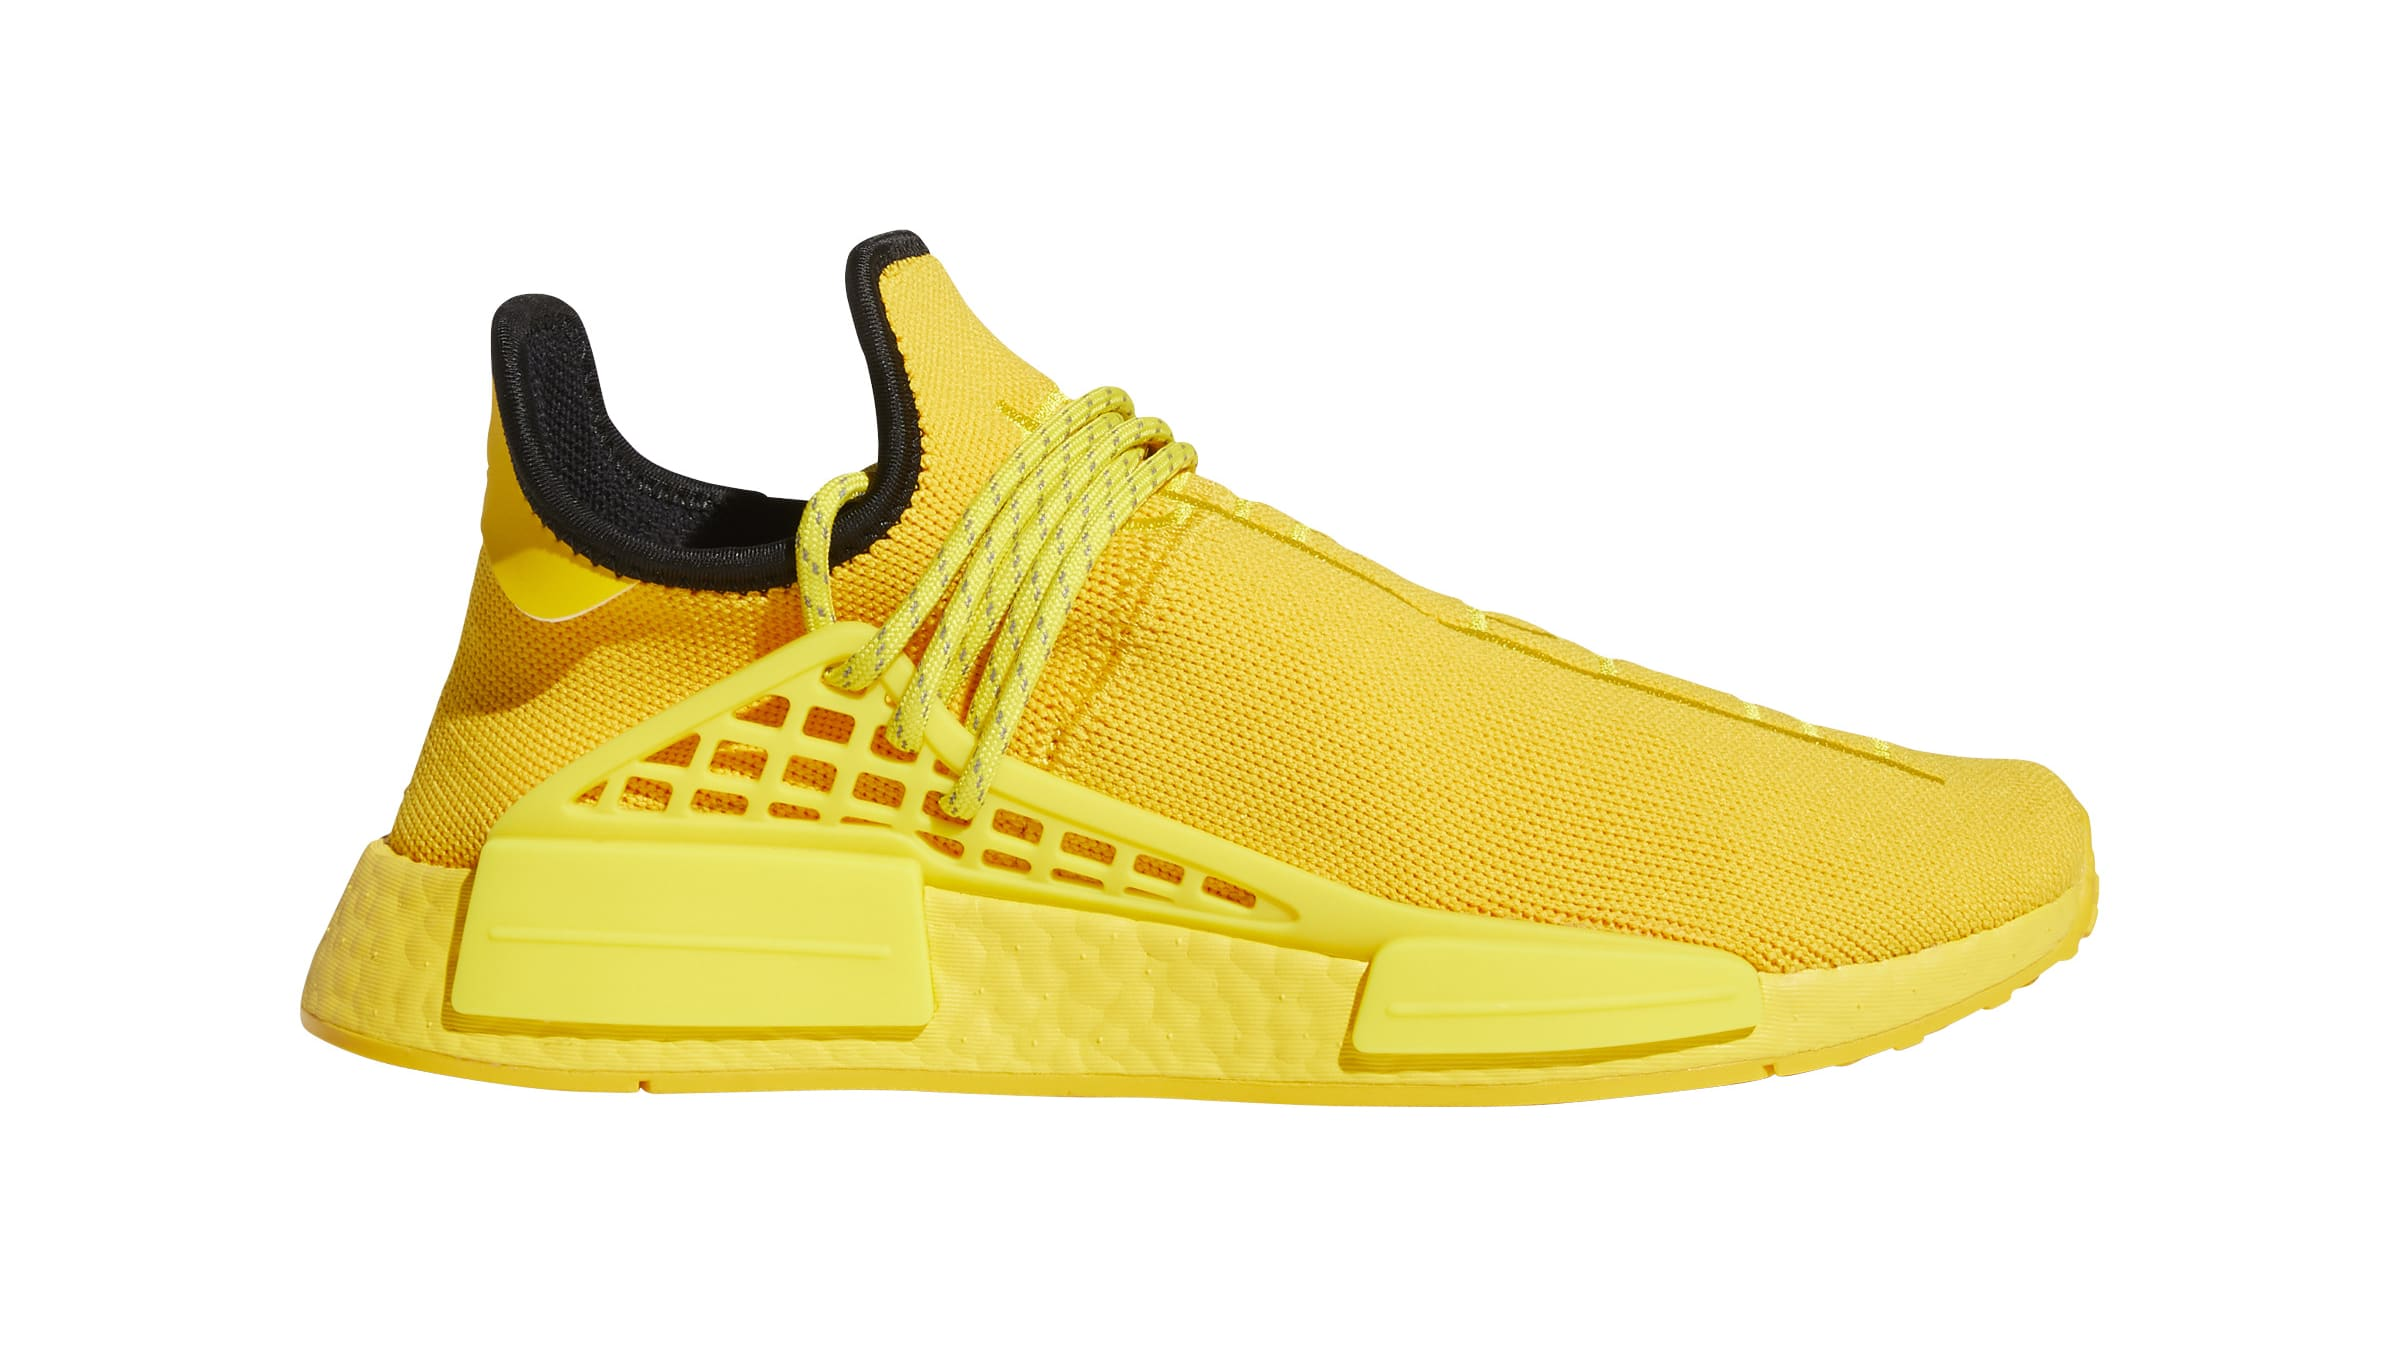 Pharrell x Adidas NMD Hu 'Yellow' GY0091 Lateral